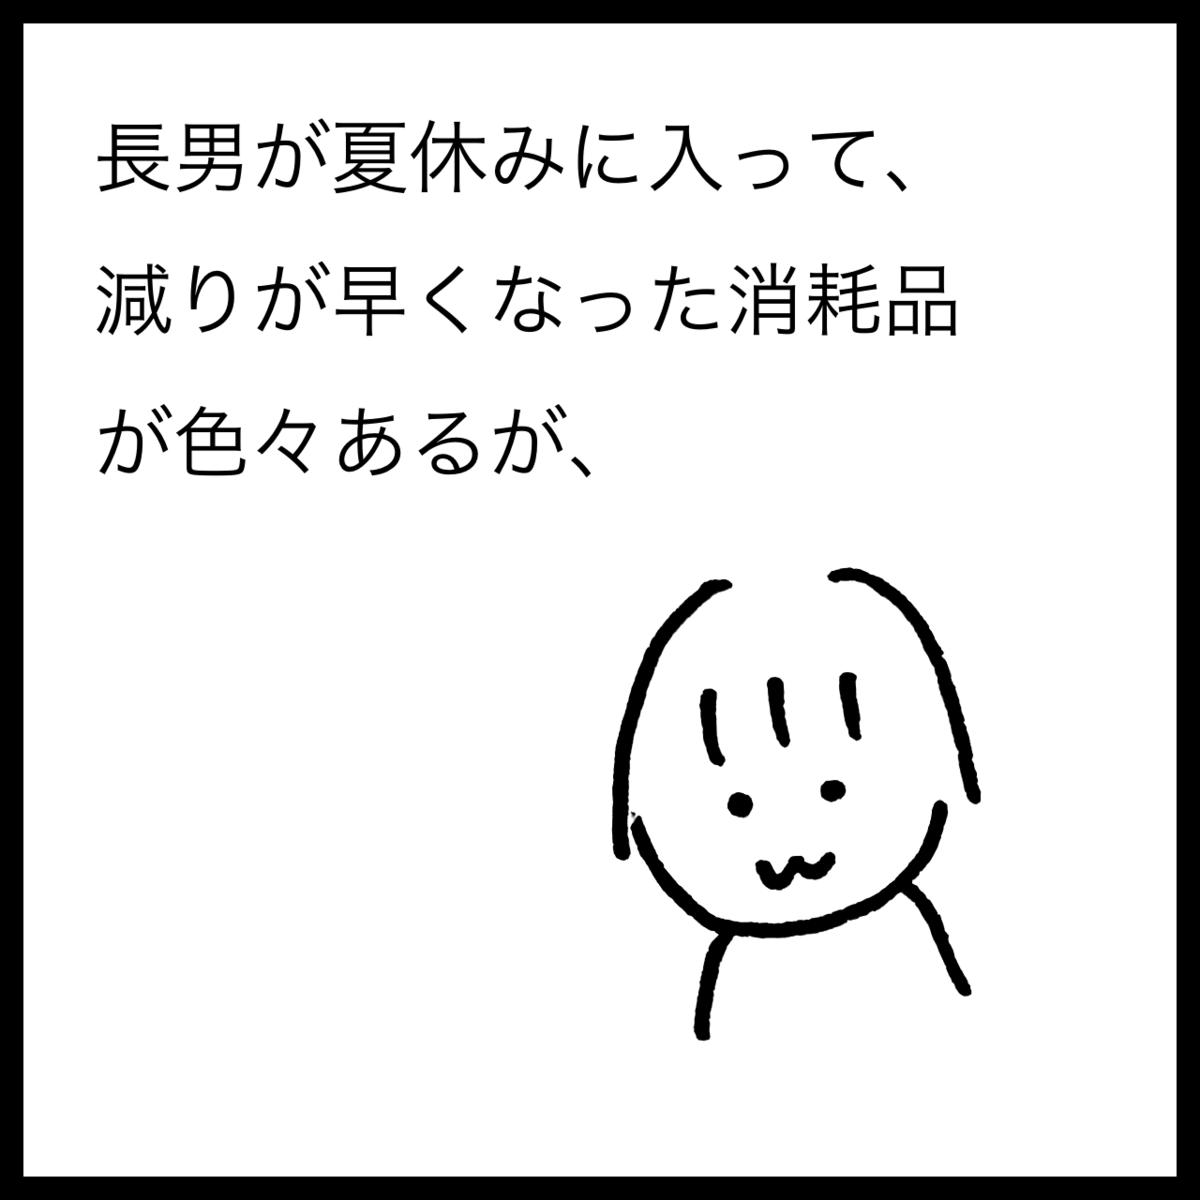 f:id:komyusyomama:20210726213531p:plain